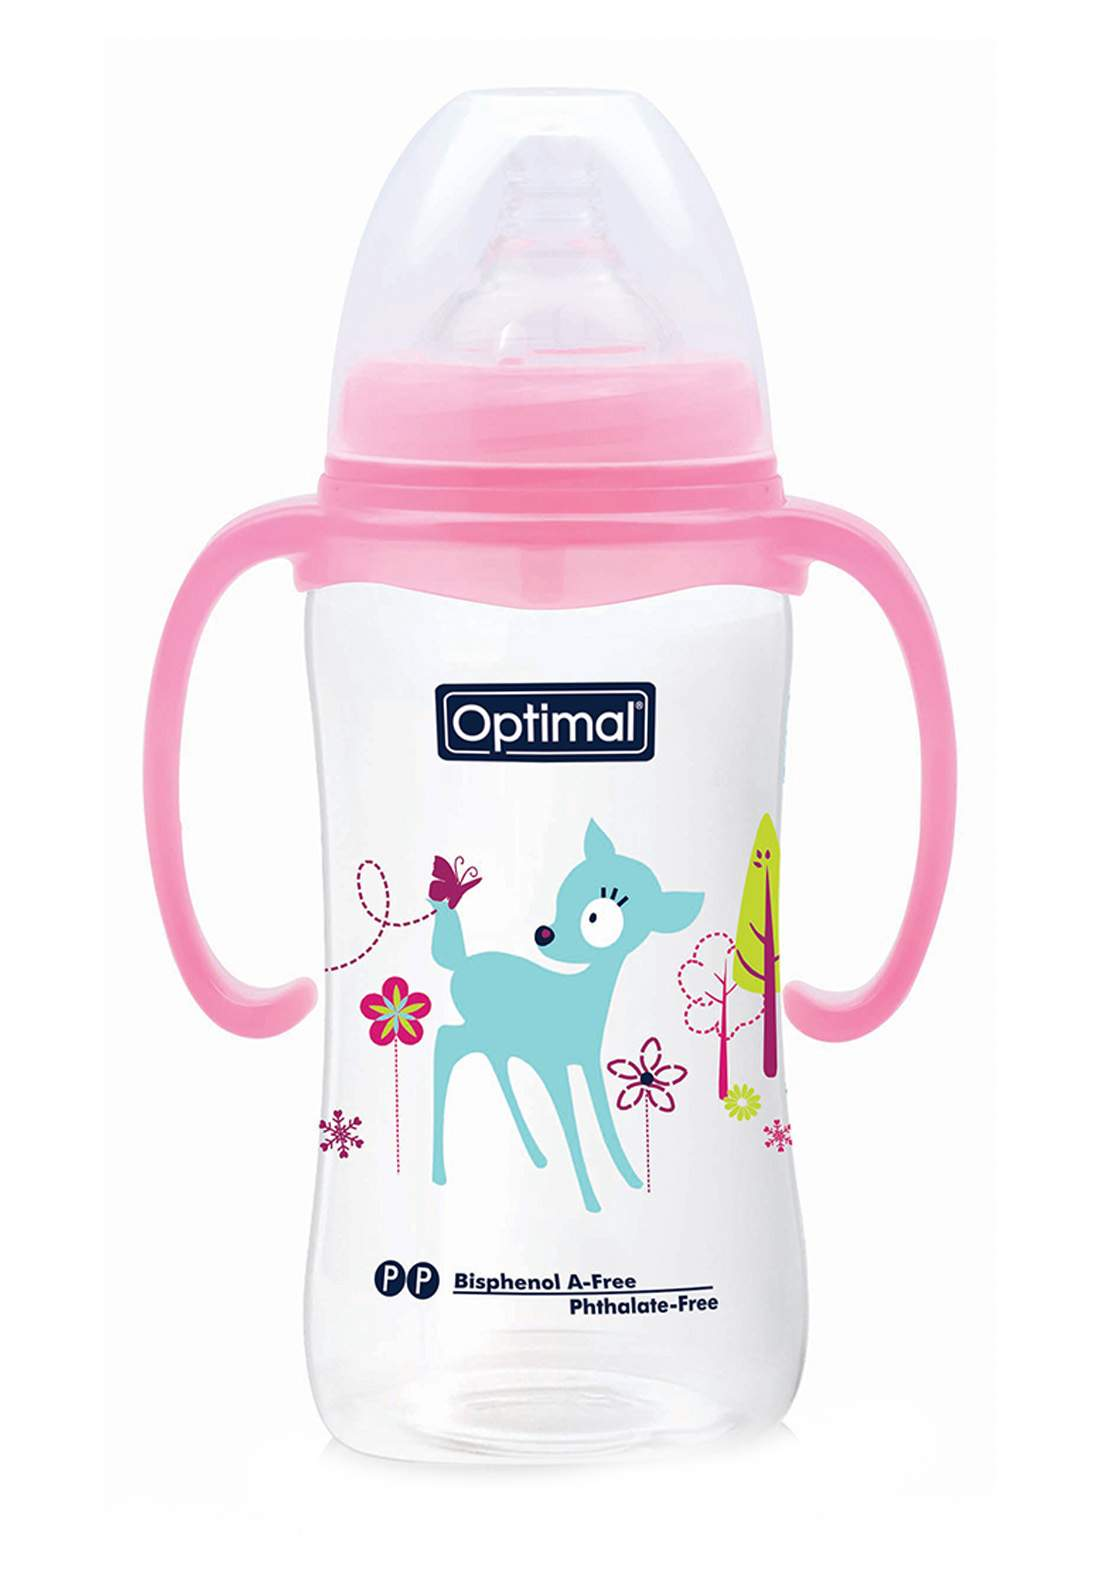 Optimal Wide Neck Feeding Bottle With Handle 300 ml رضاعة للاطفال